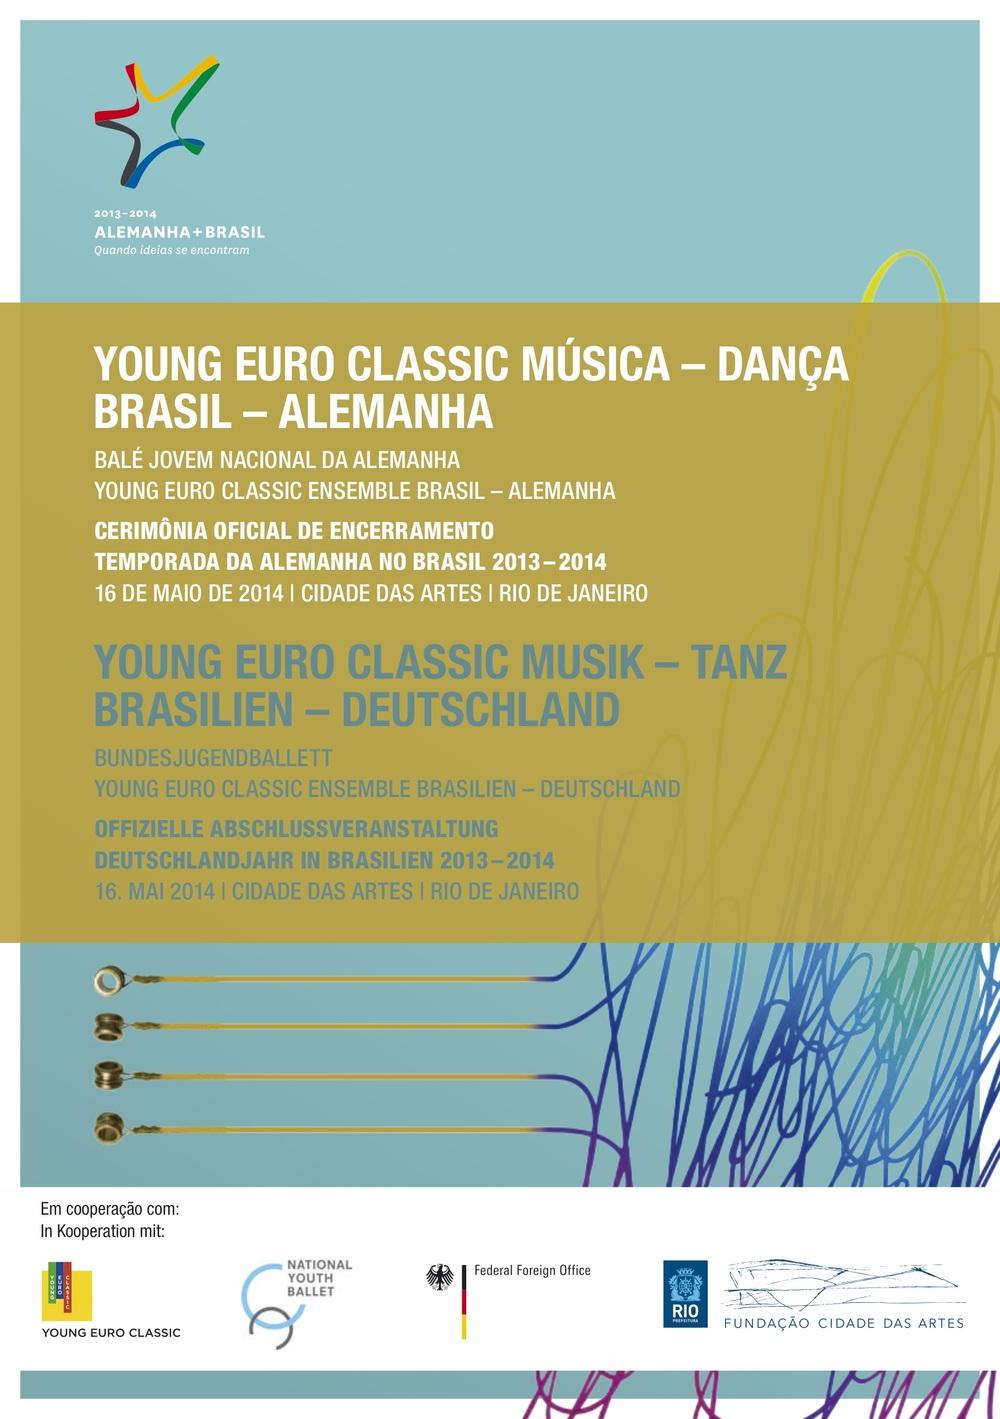 MINZ-11178_Programmheft_Brasil_Rio_2014_140505_RZ_150_1.jpg